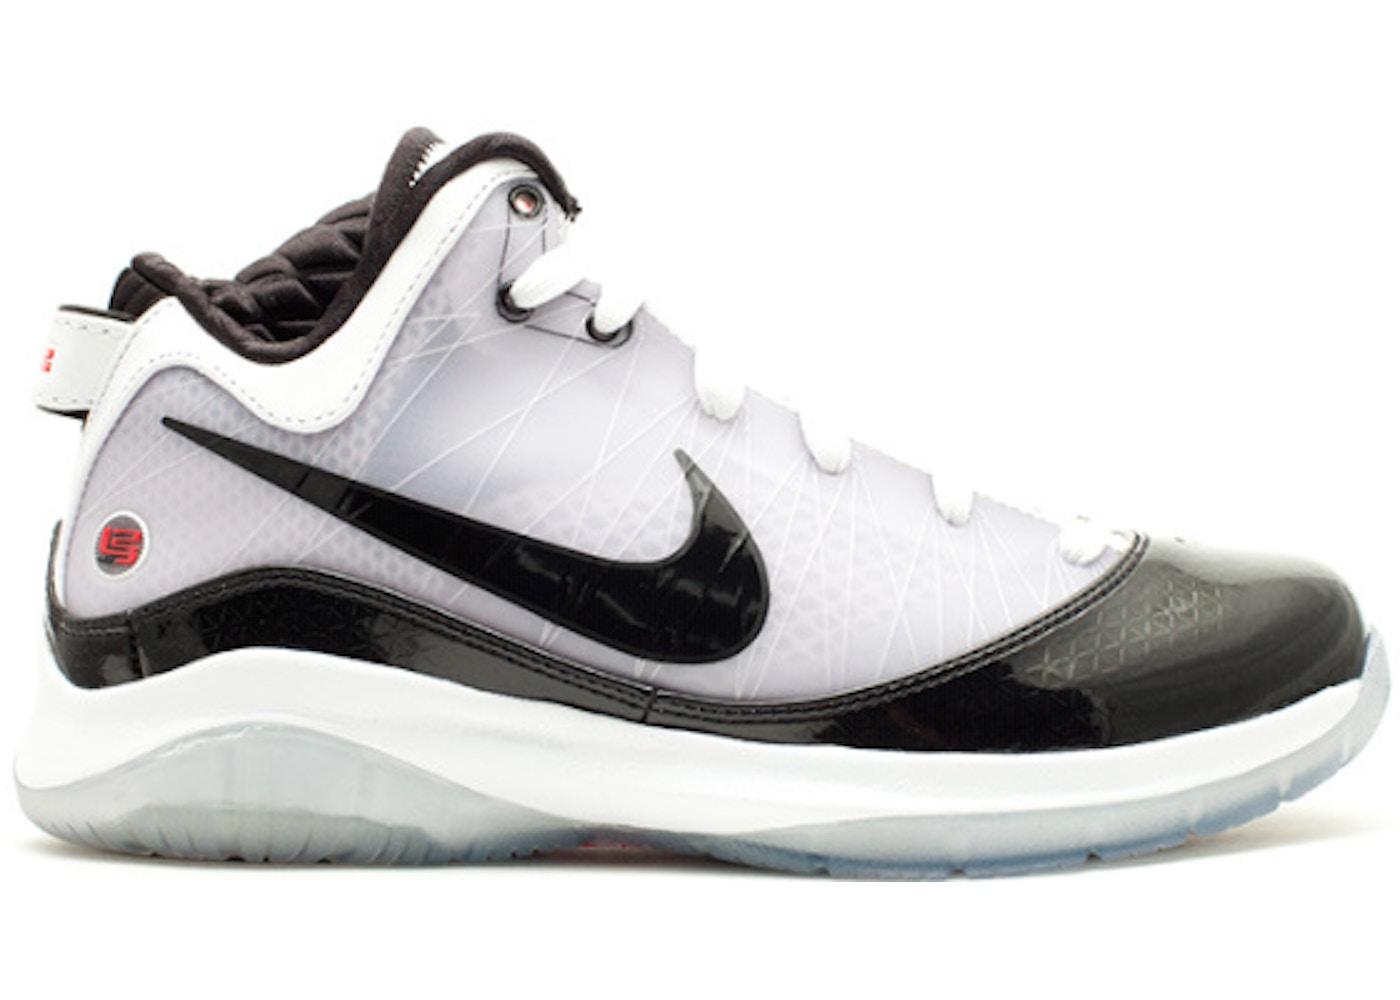 online store 45182 f5723 Nike LeBron 7 Shoes - Last Sale